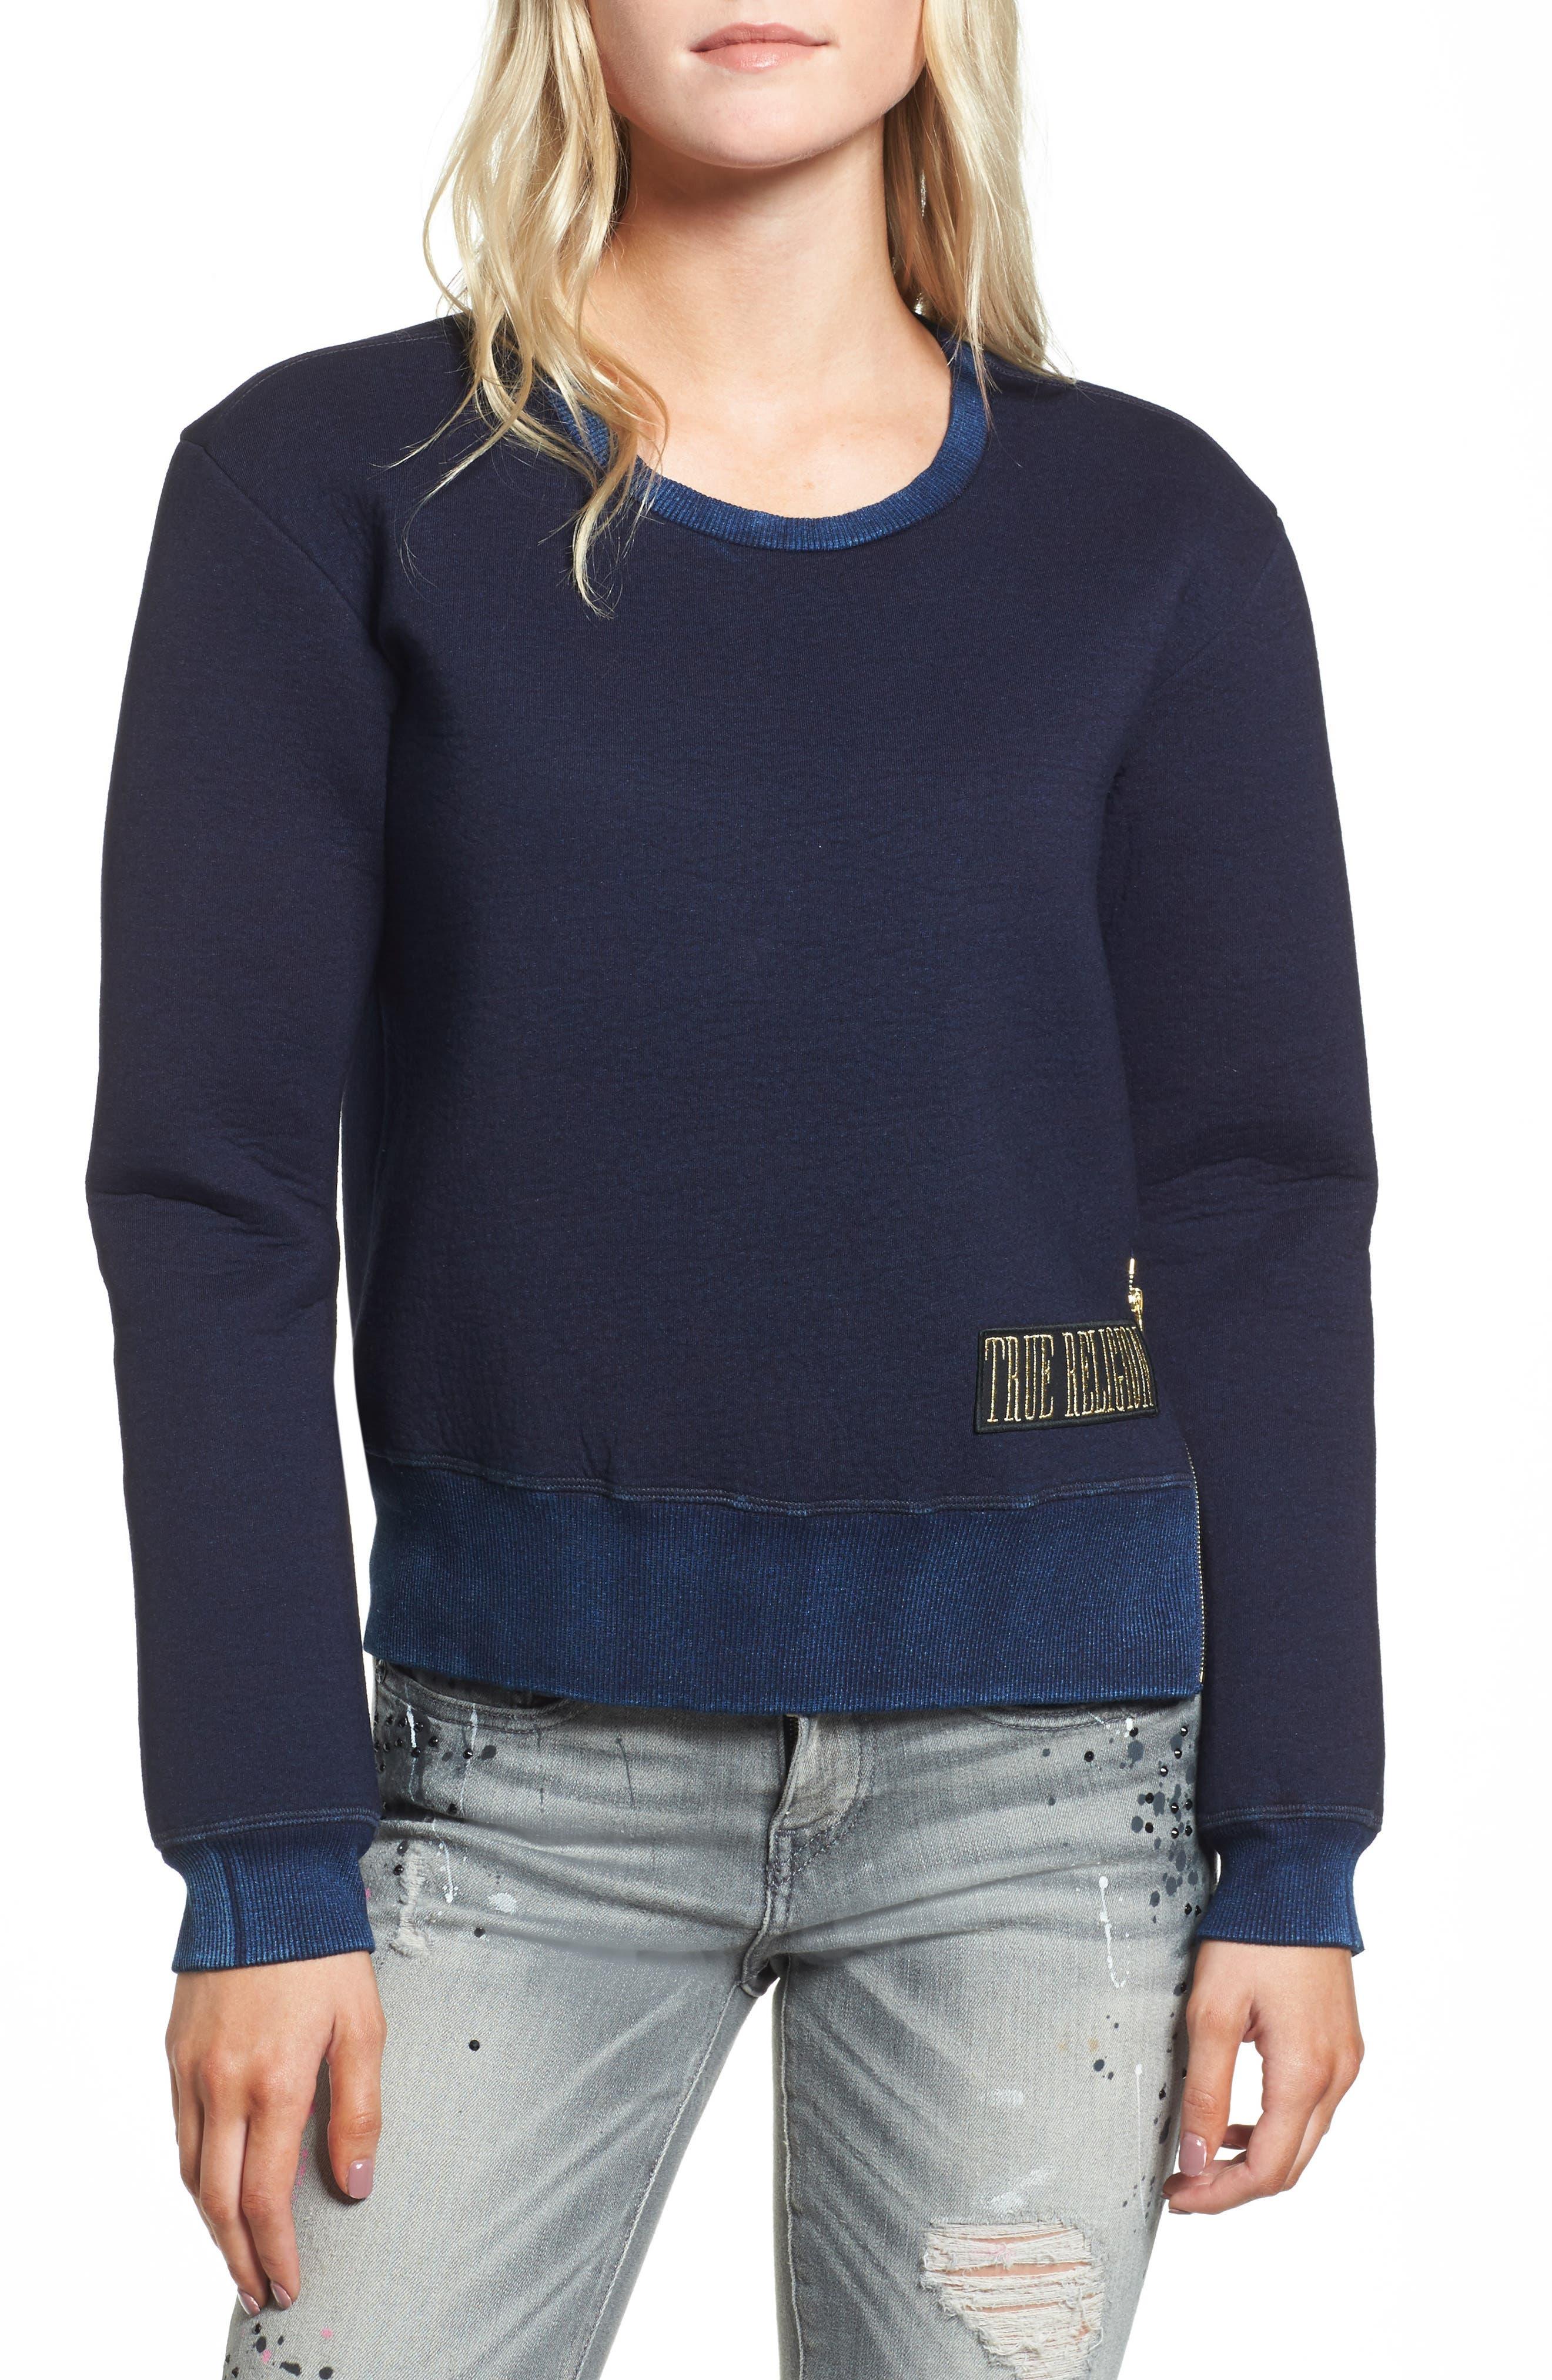 Main Image - True Religion Brand Jeans Neoprene Sweatshirt